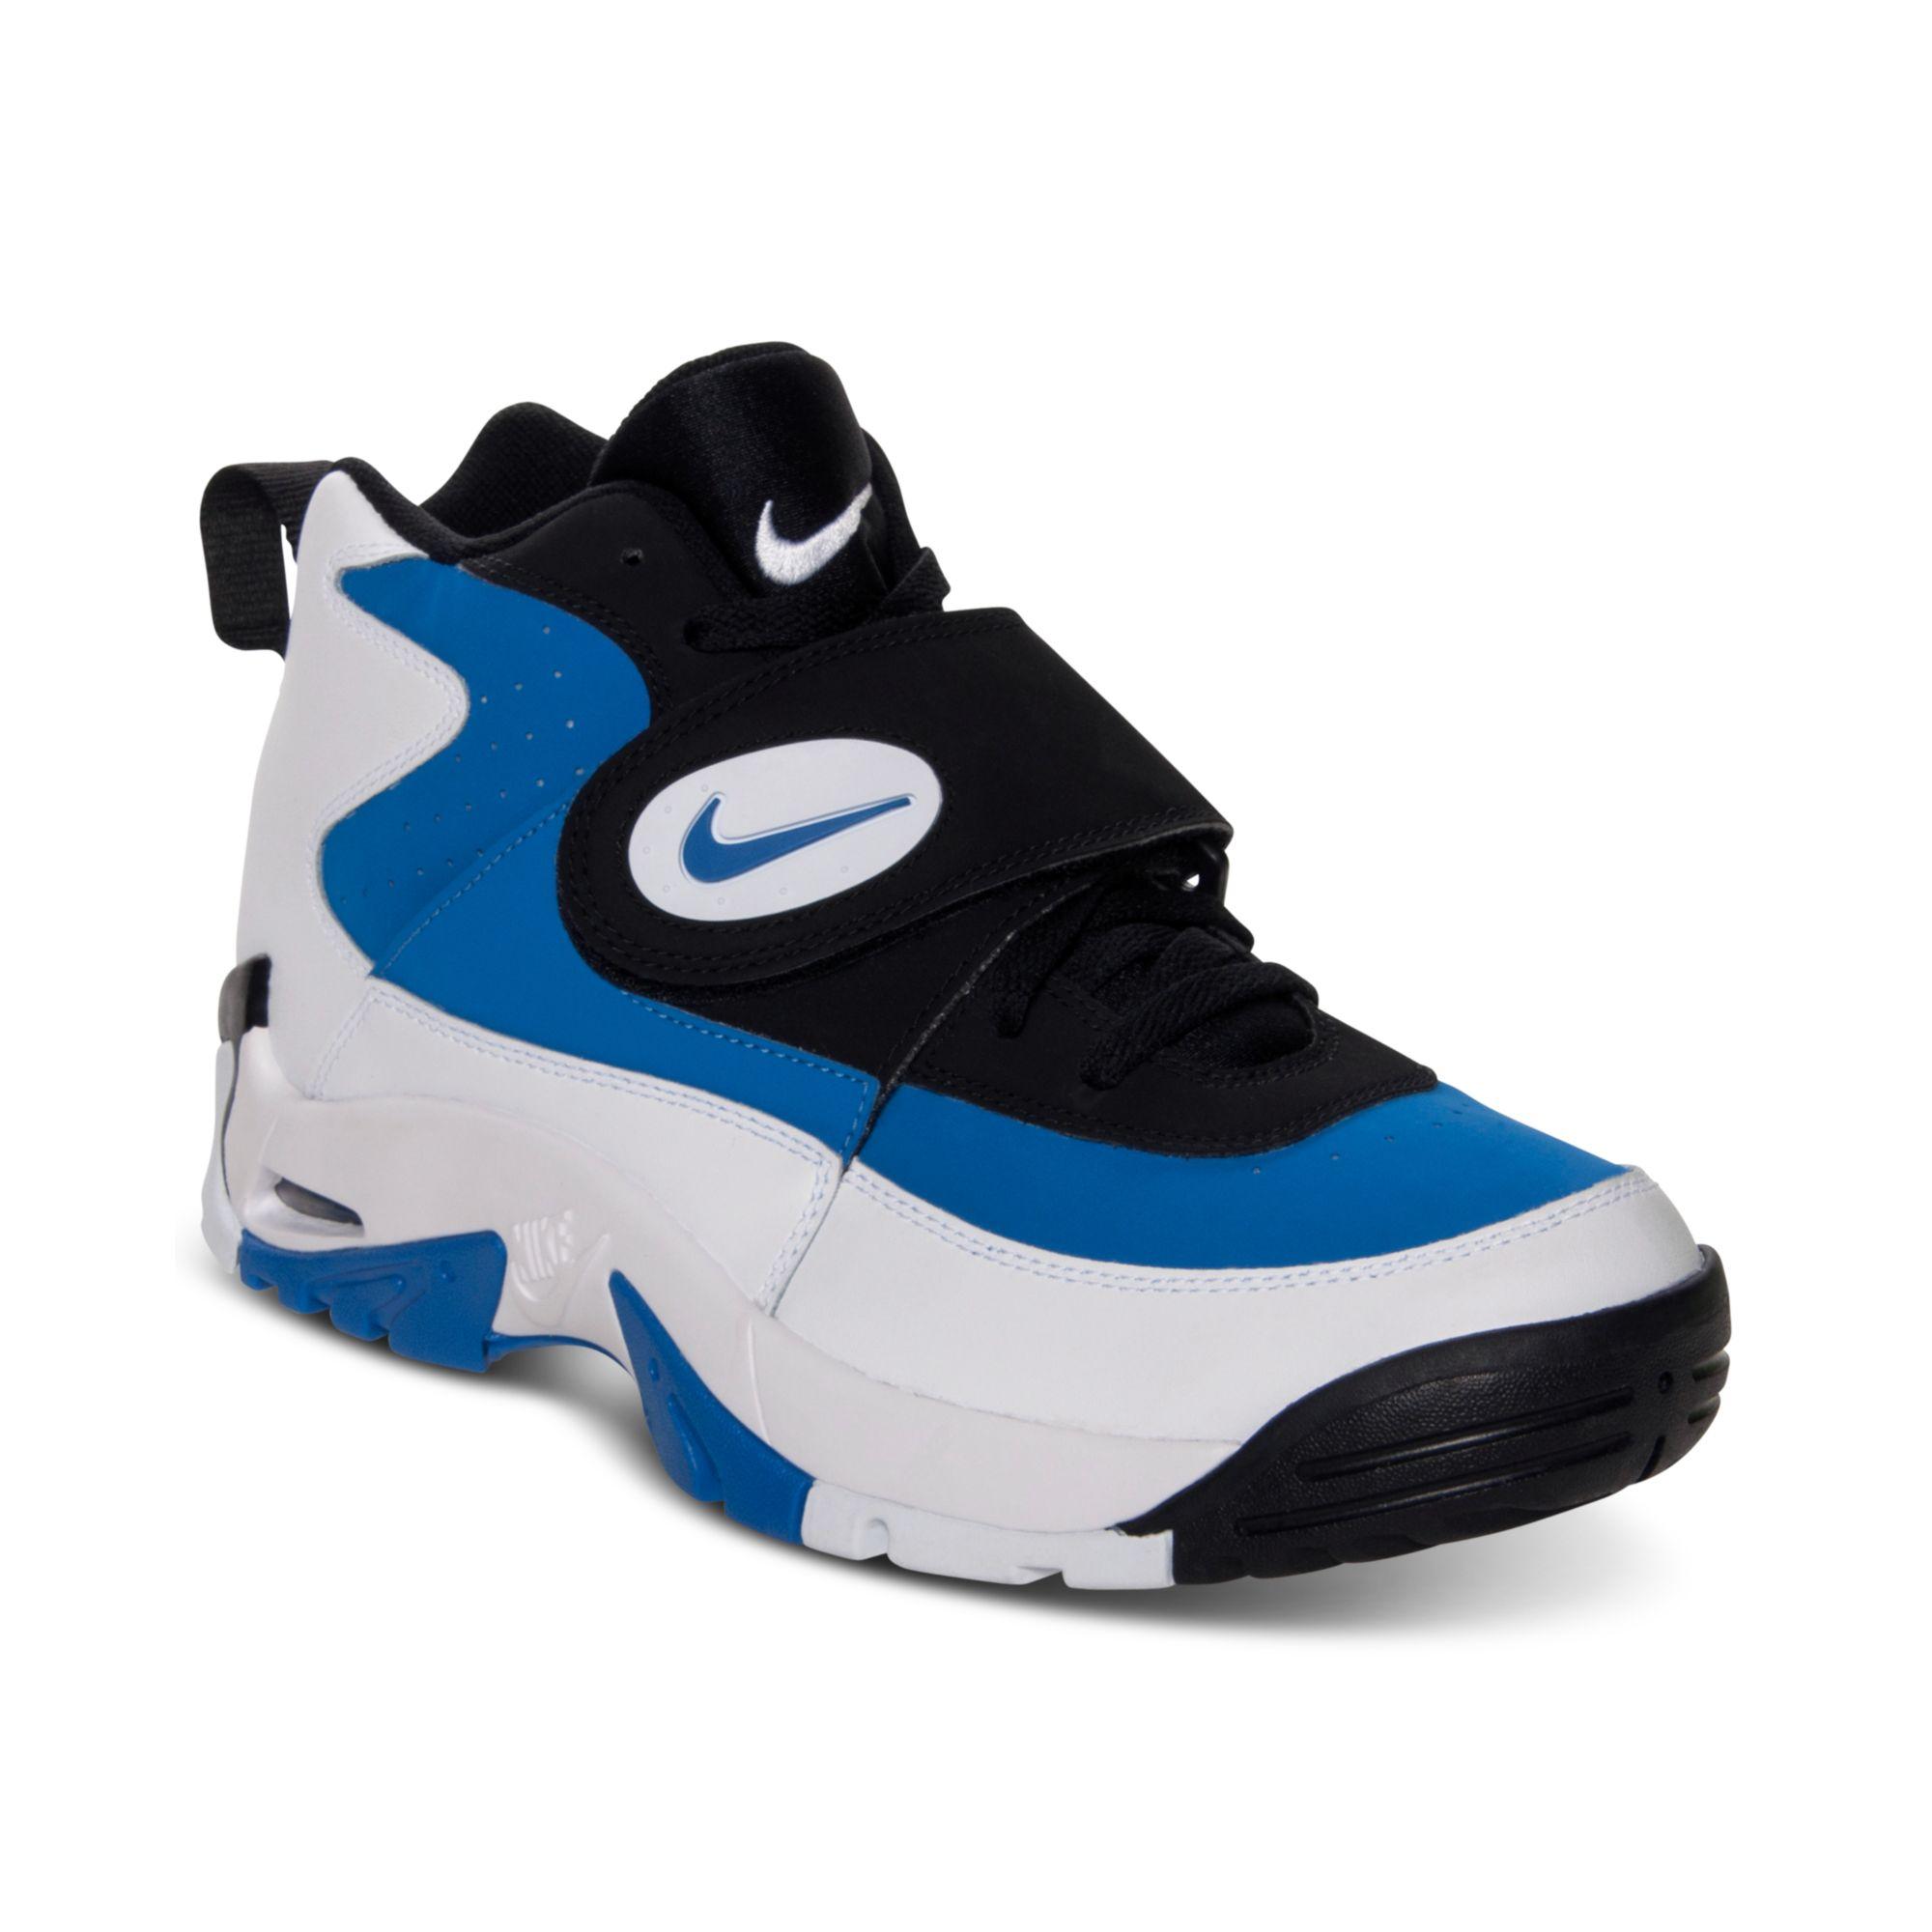 Mens Nike Air Mission Training Shoes